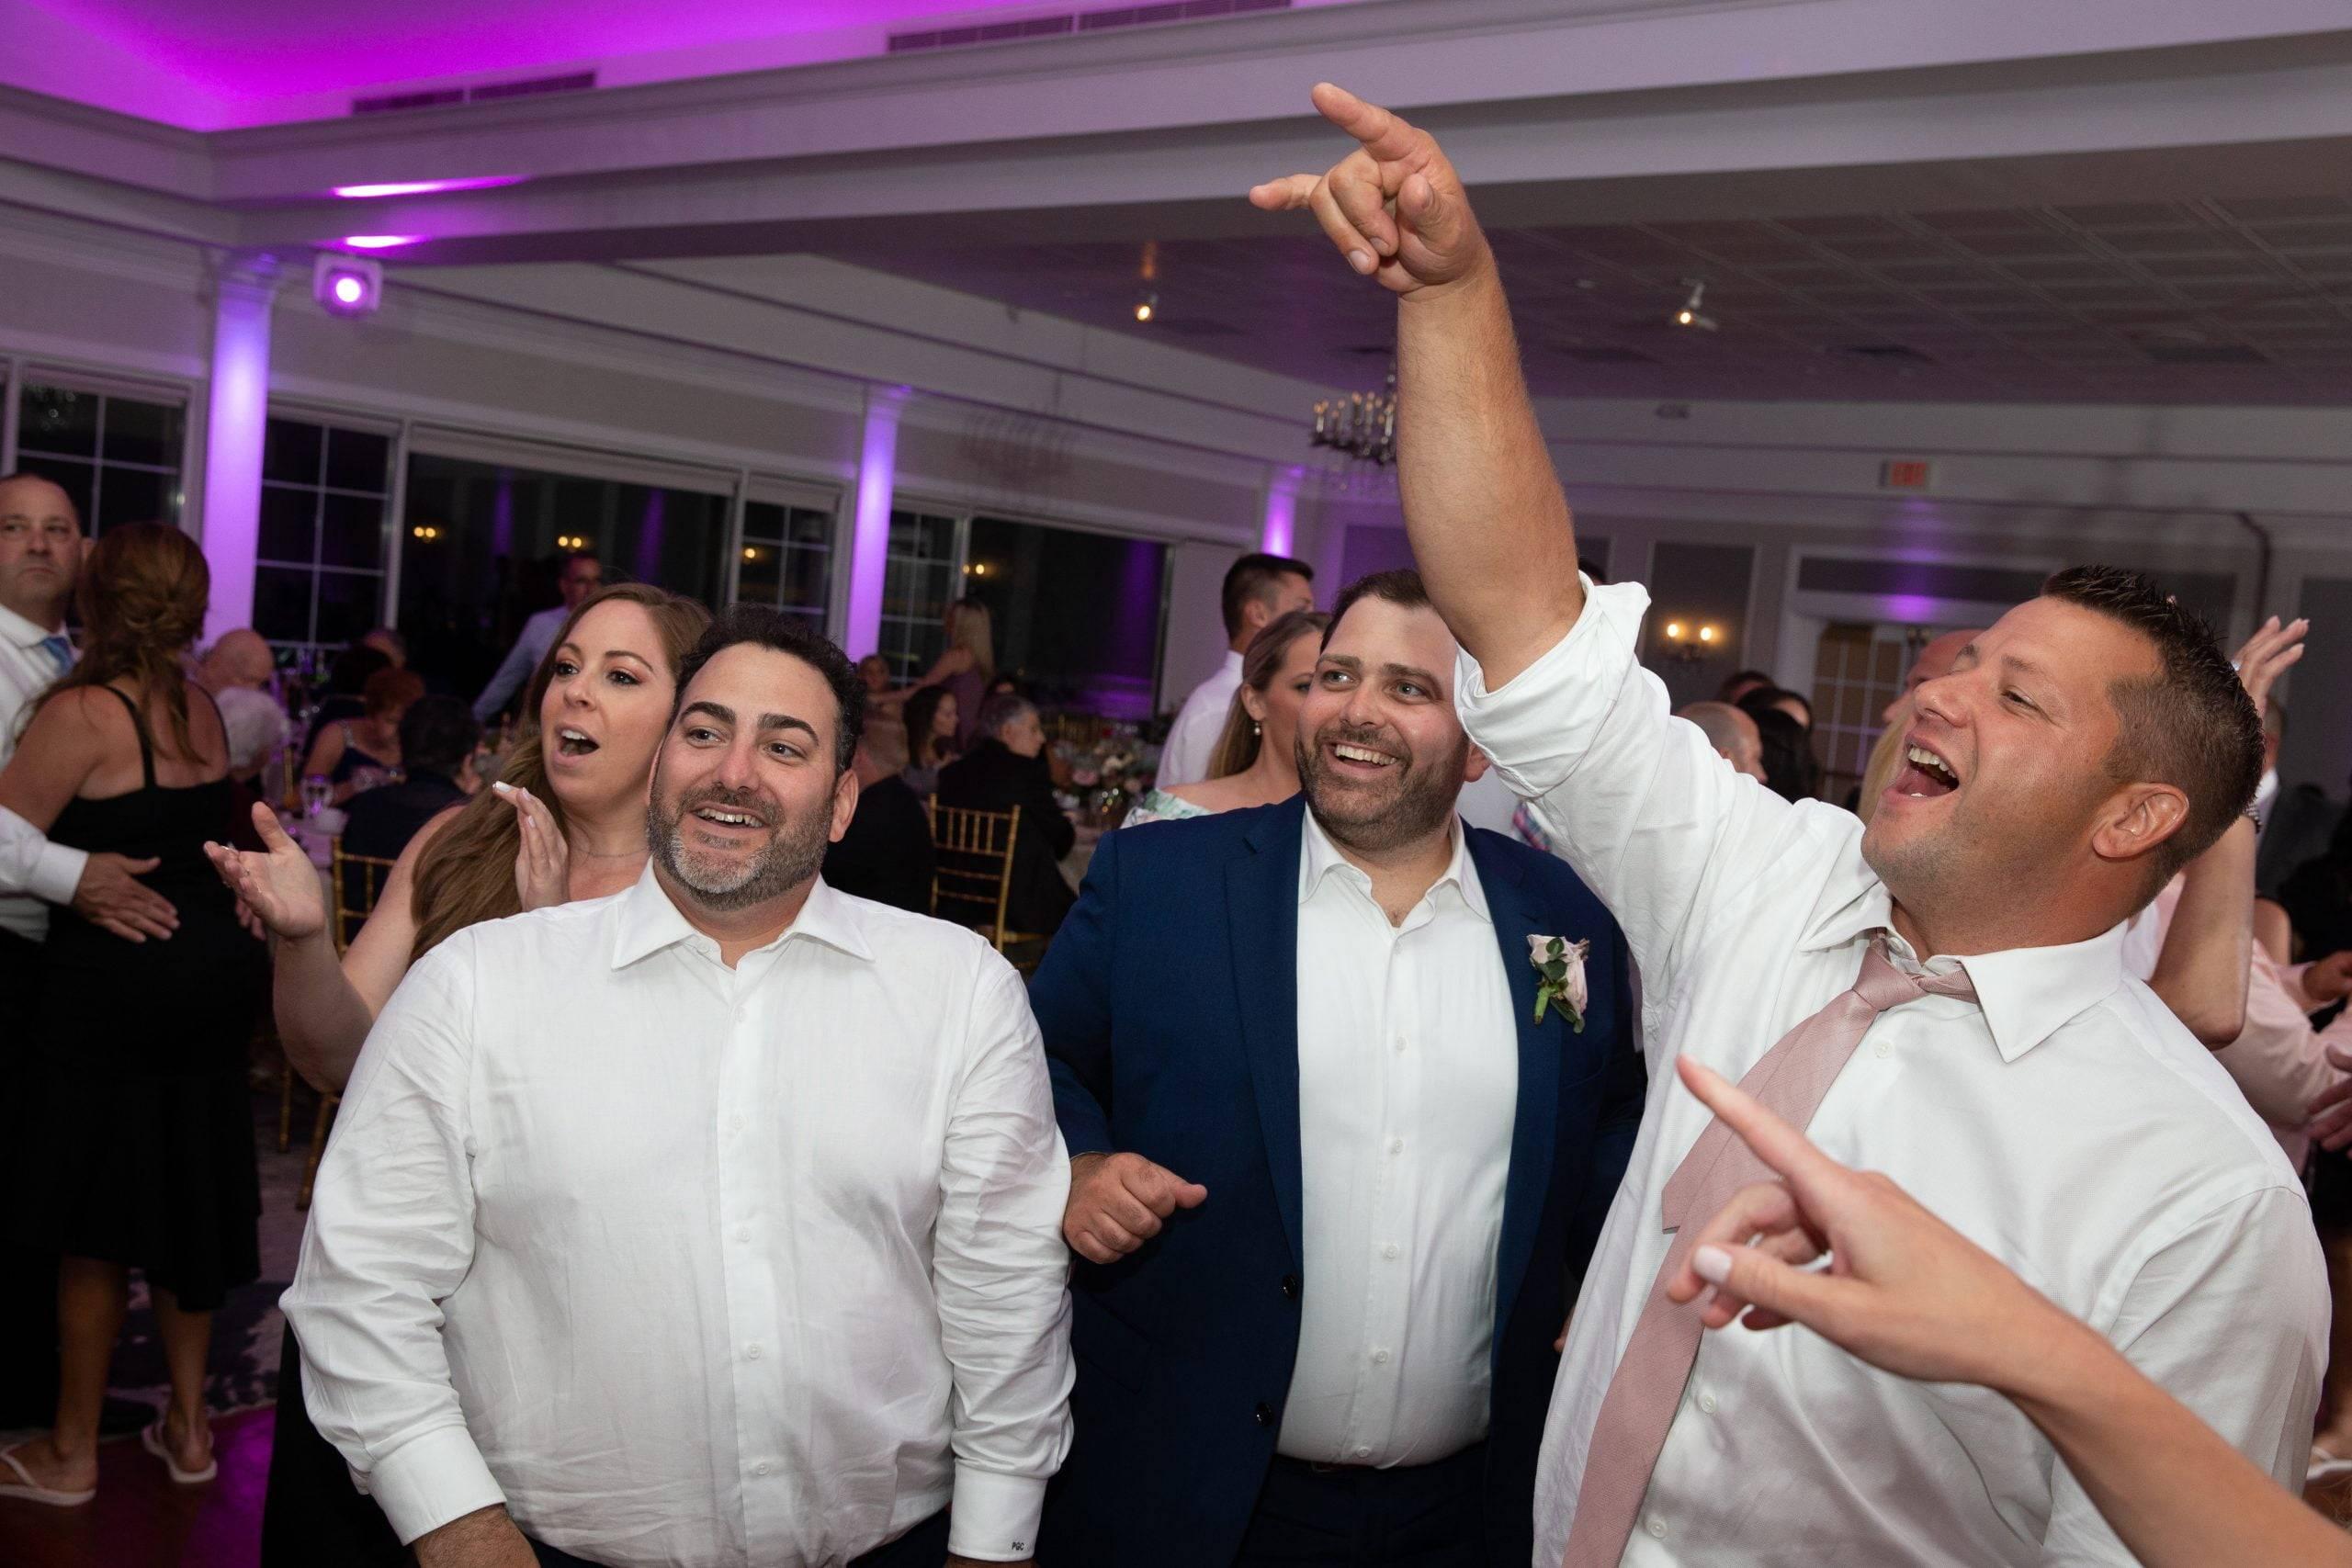 Brooklake groomsmen dancing